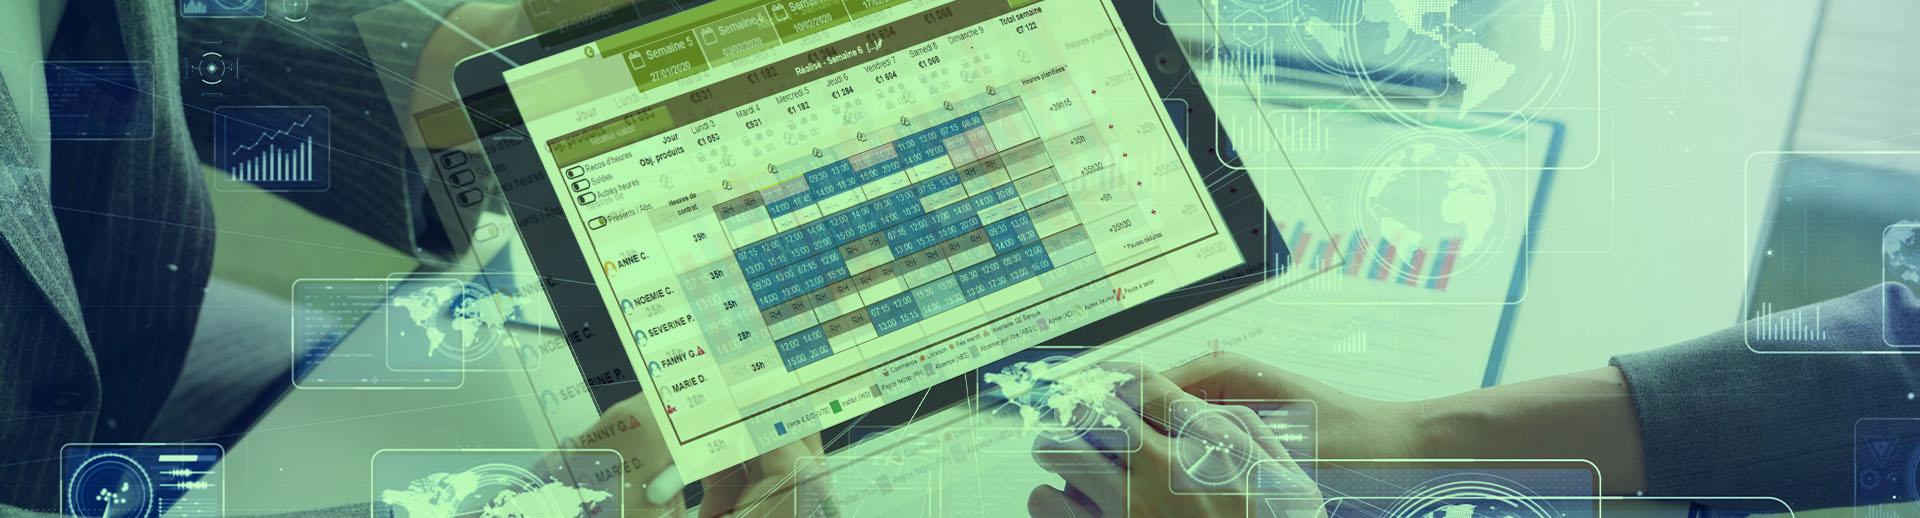 Cabinet de conseil transformation digitale distribution